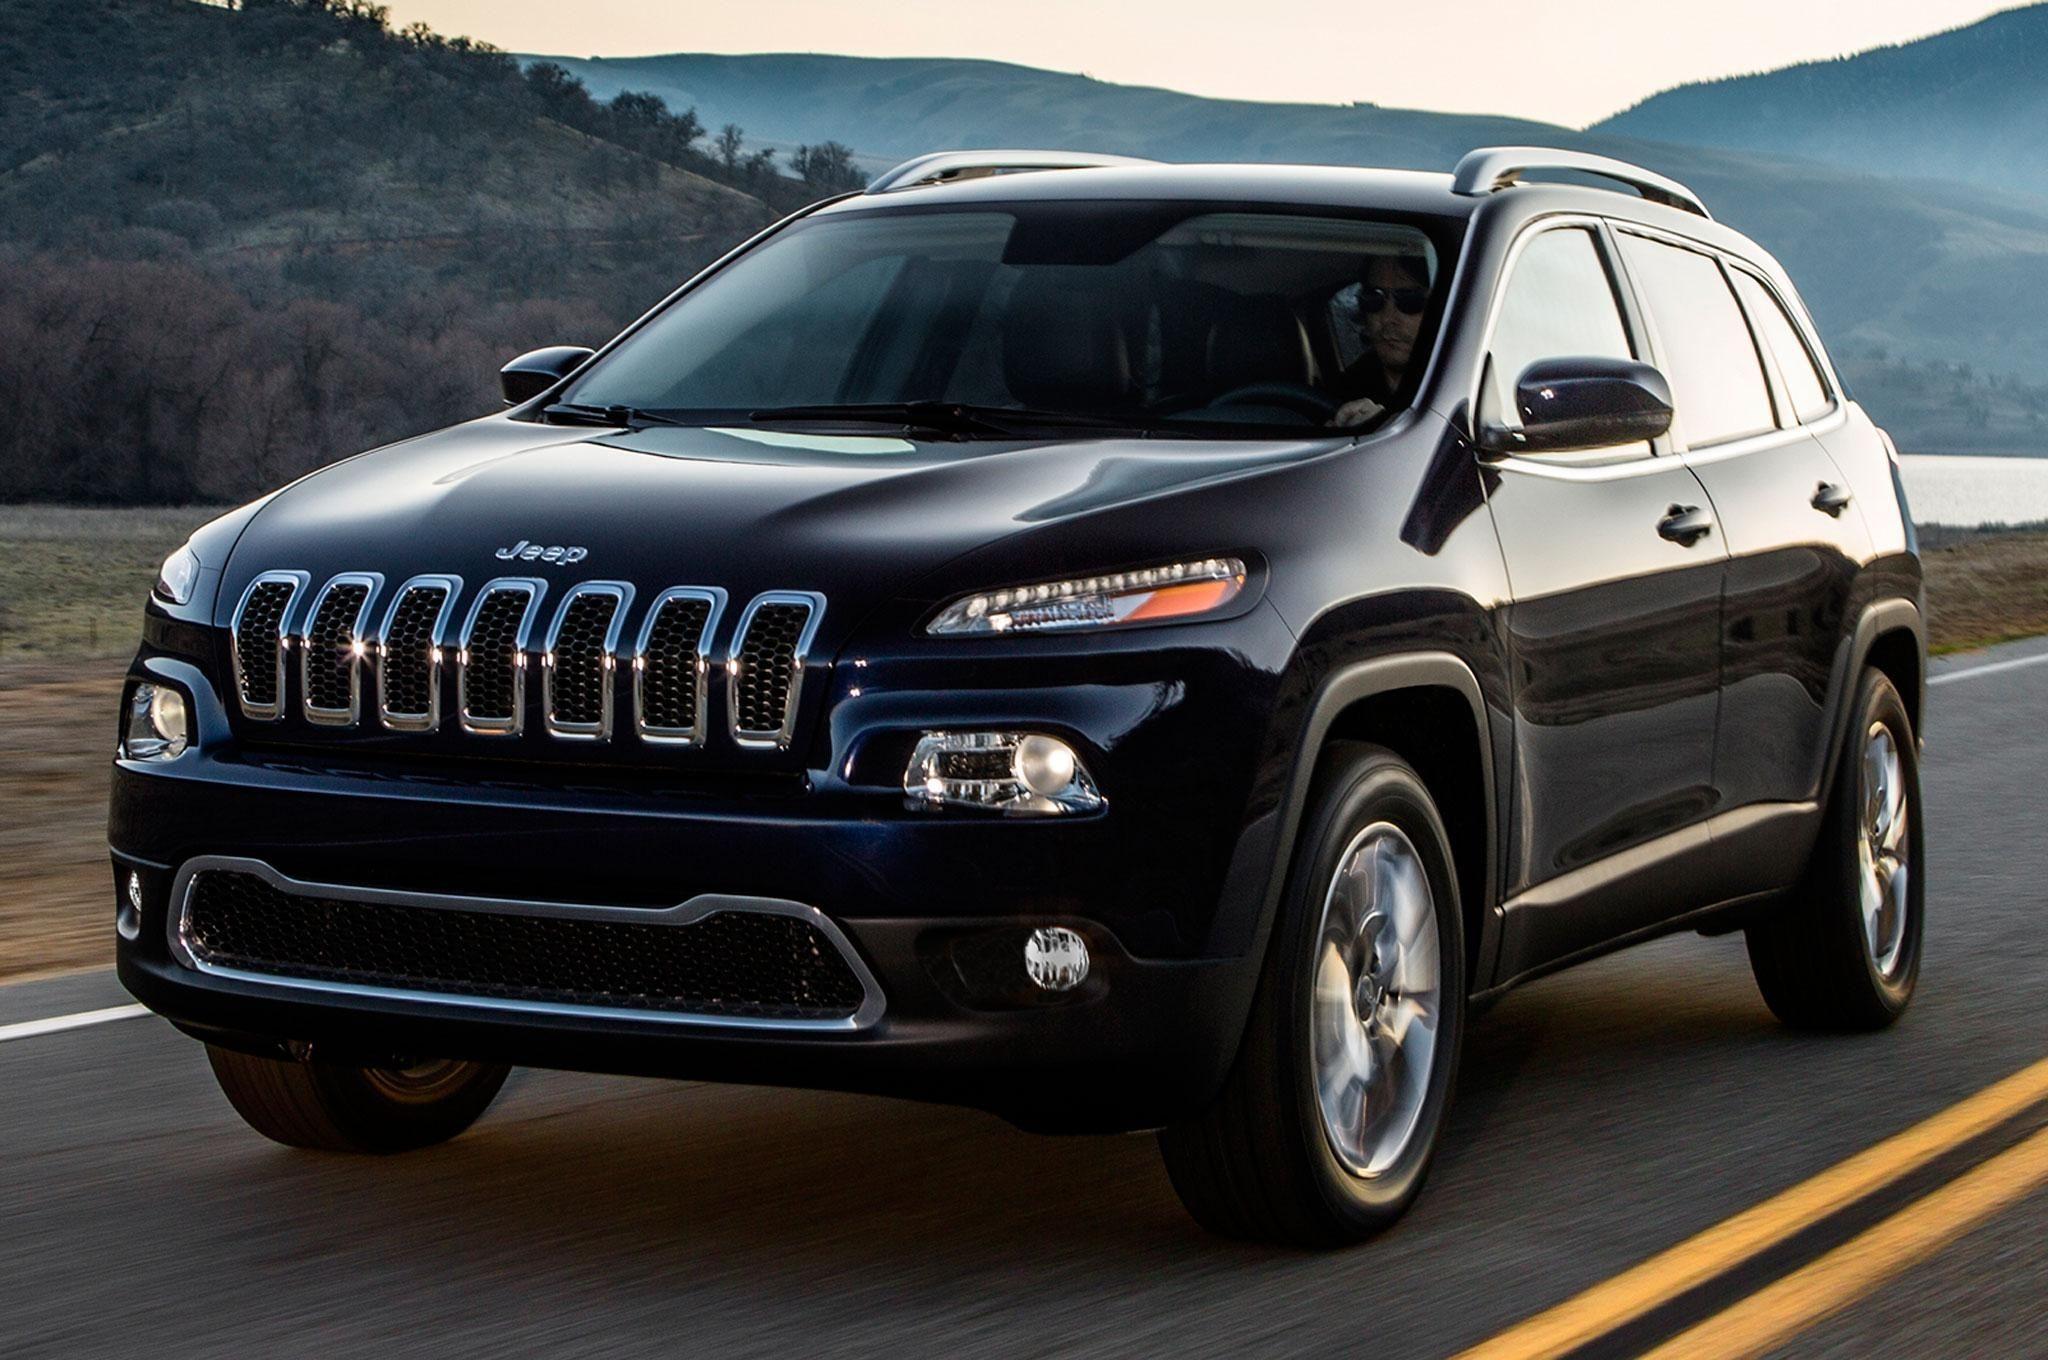 Nissan Xterra Fuel Level Sensor Tags P0463 Jeep Grand Cherokee In 2018 Jeep Cherokee Mpg Interior Exterior And Review Jeep Jeep Cherokee Classic Car Insurance